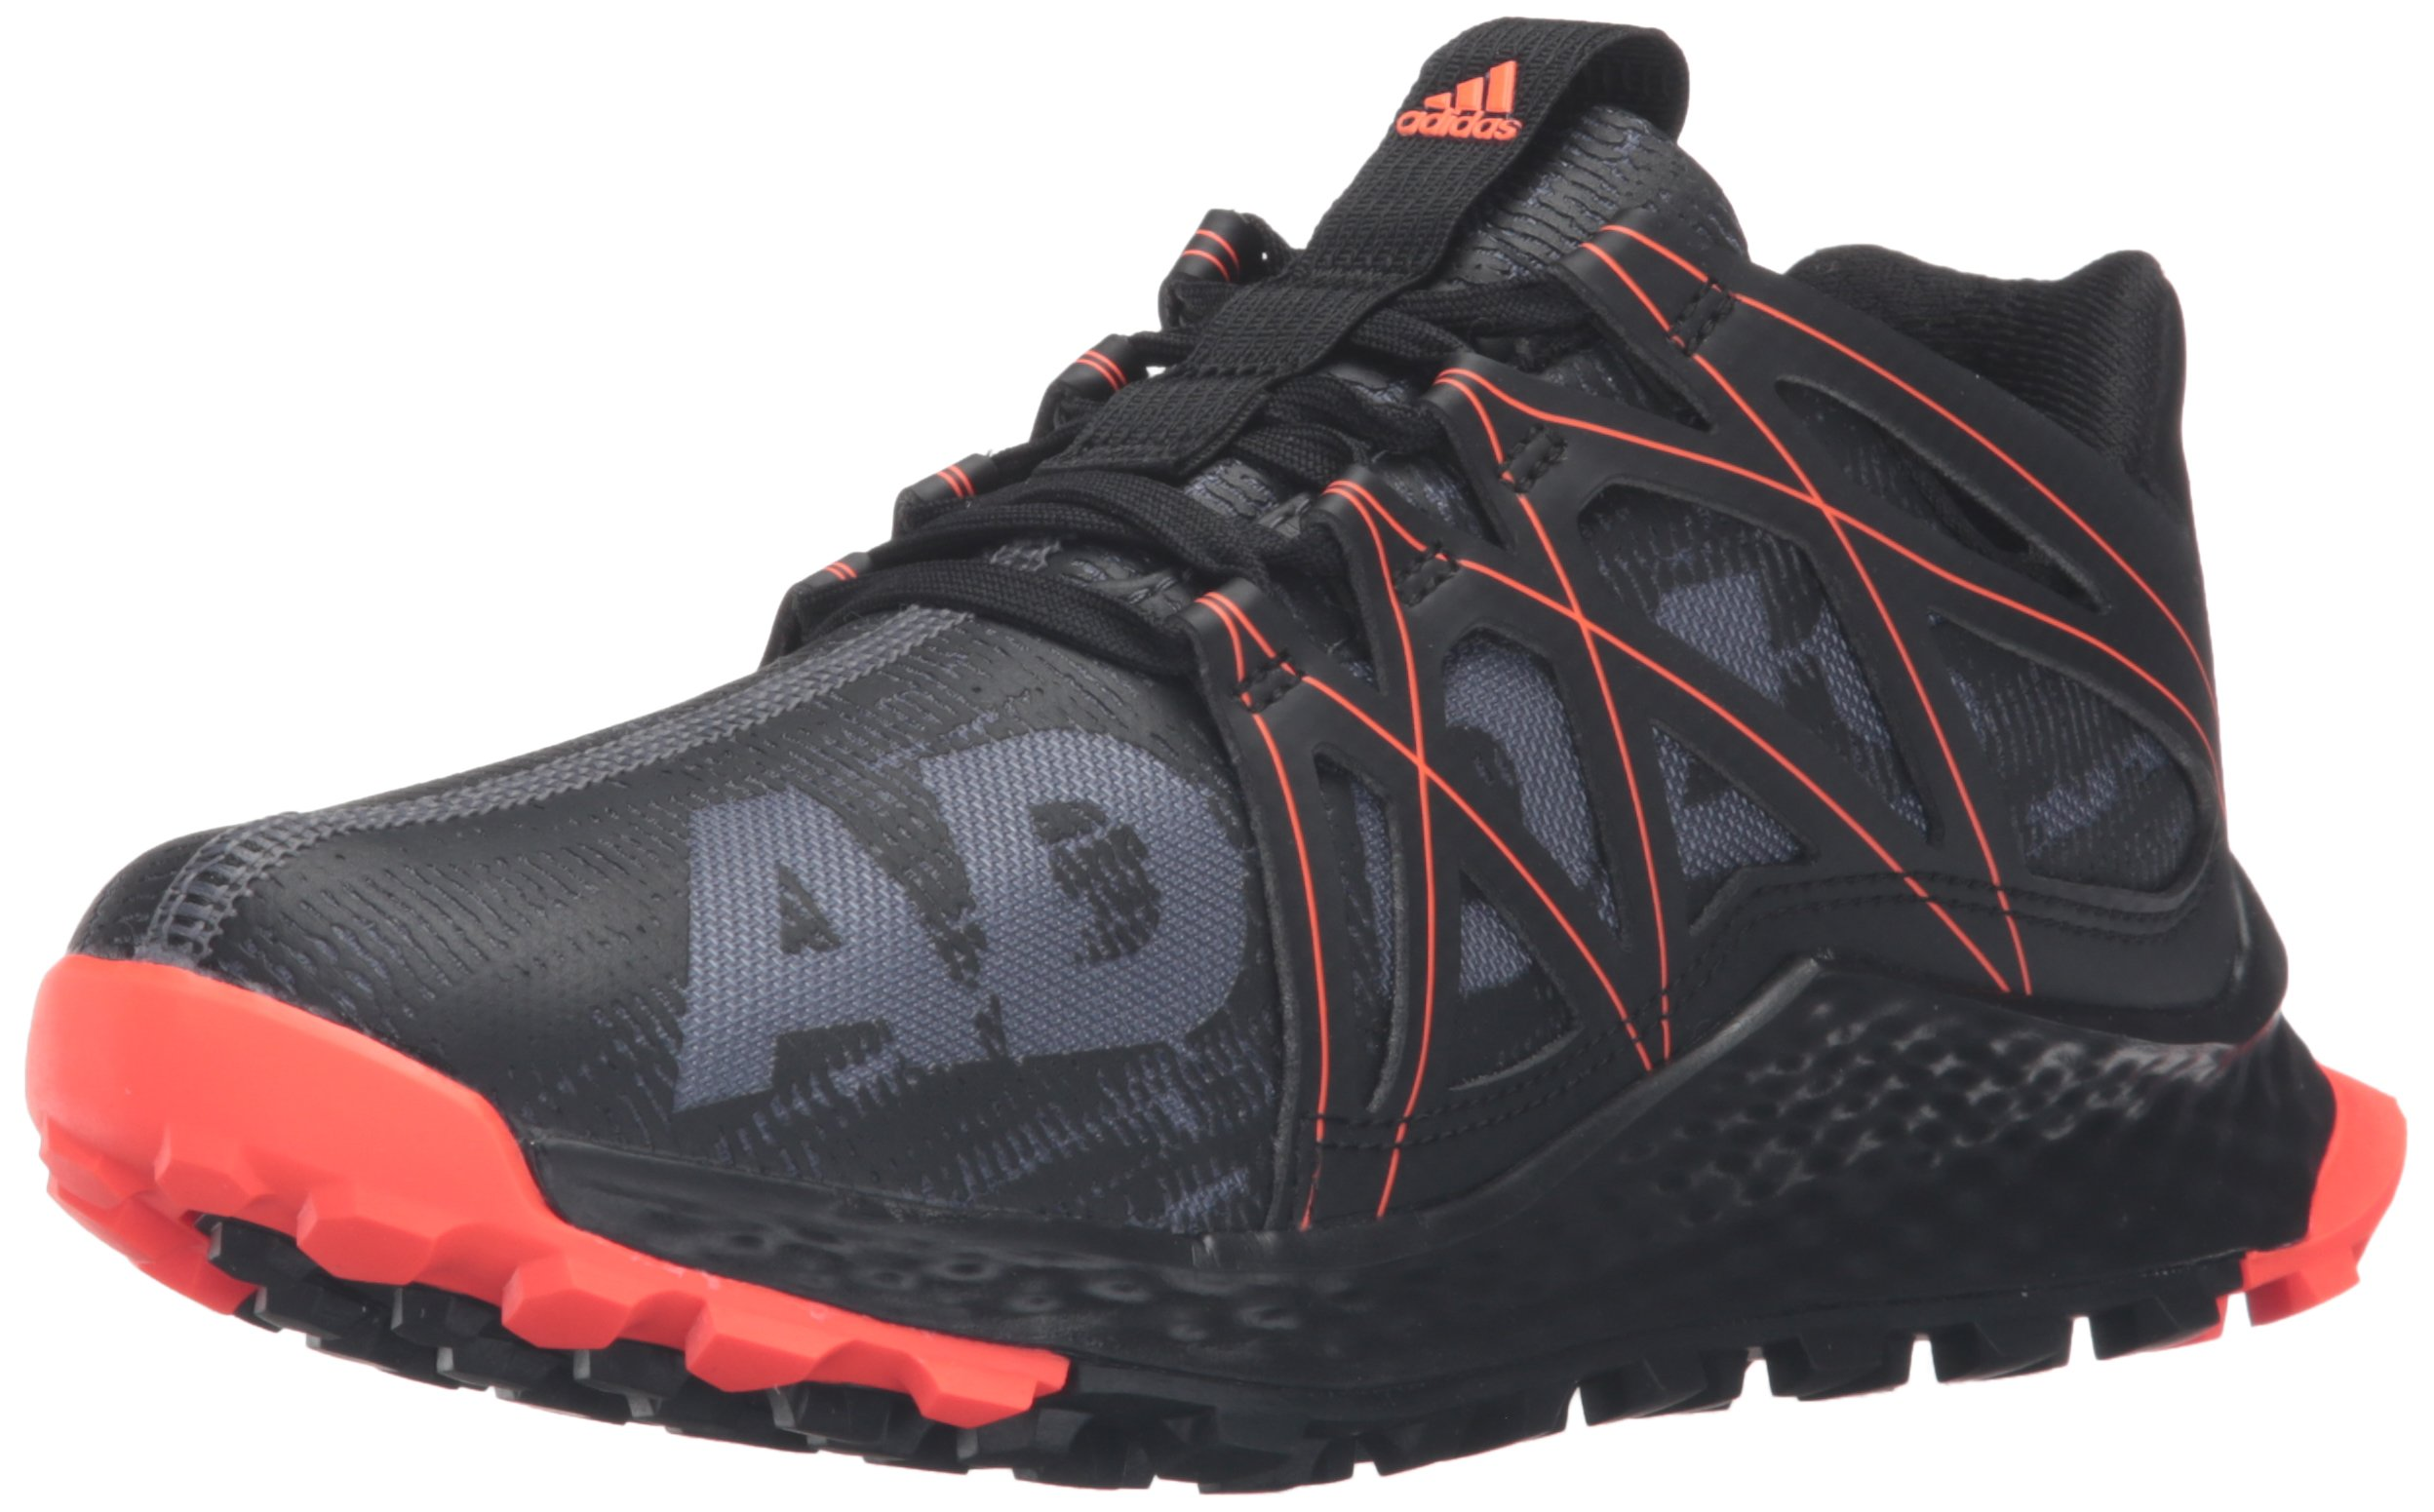 99bba3d8fb234 Galleon - Adidas Performance Boys  Vigor Bounce J Trail Runner